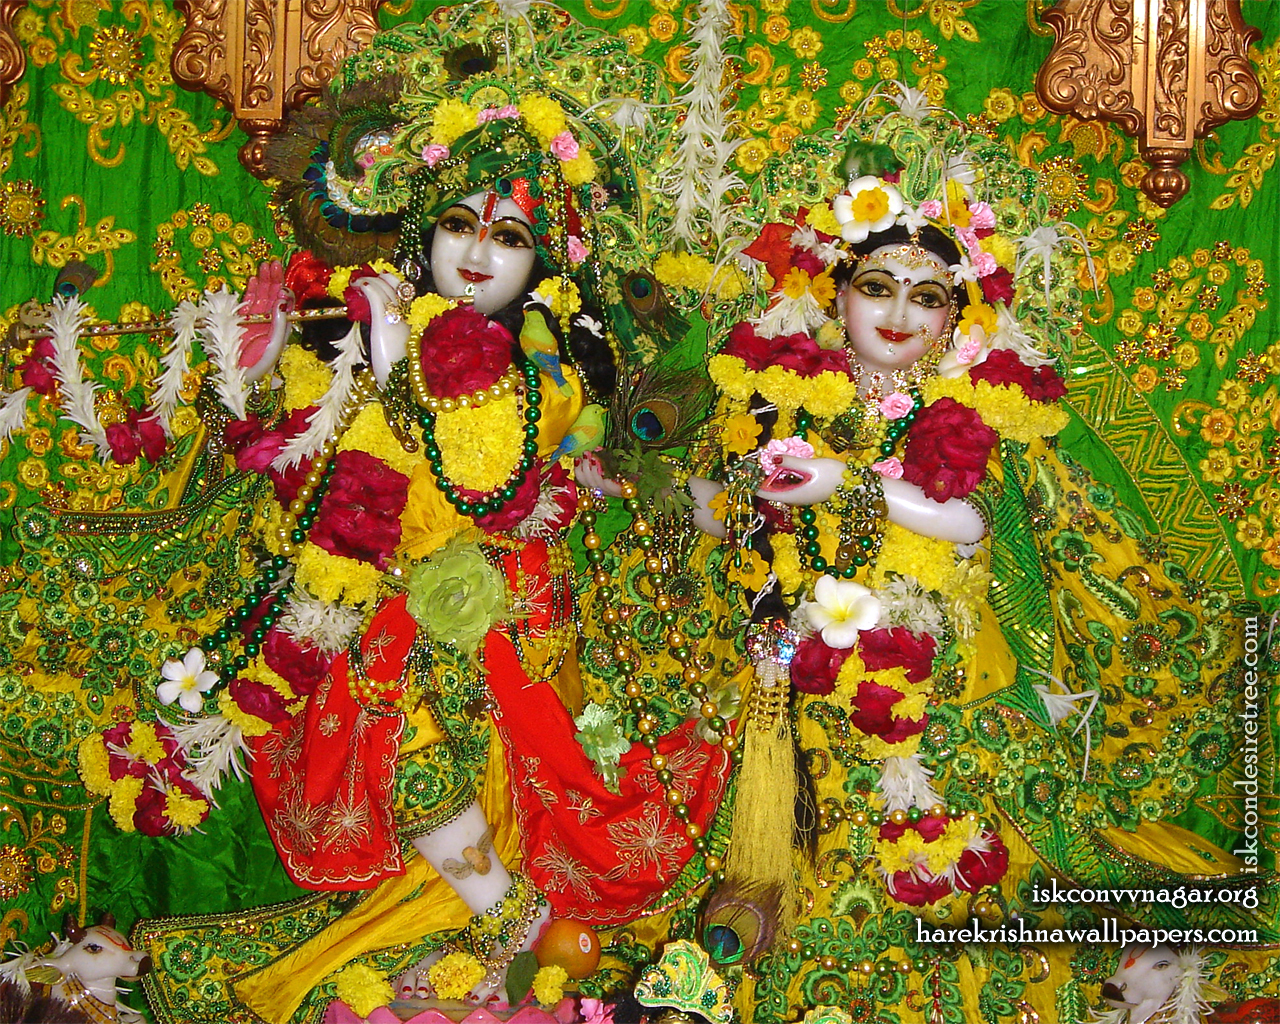 Sri Sri Radha Giridhari Wallpaper (011) Size 1280x1024 Download